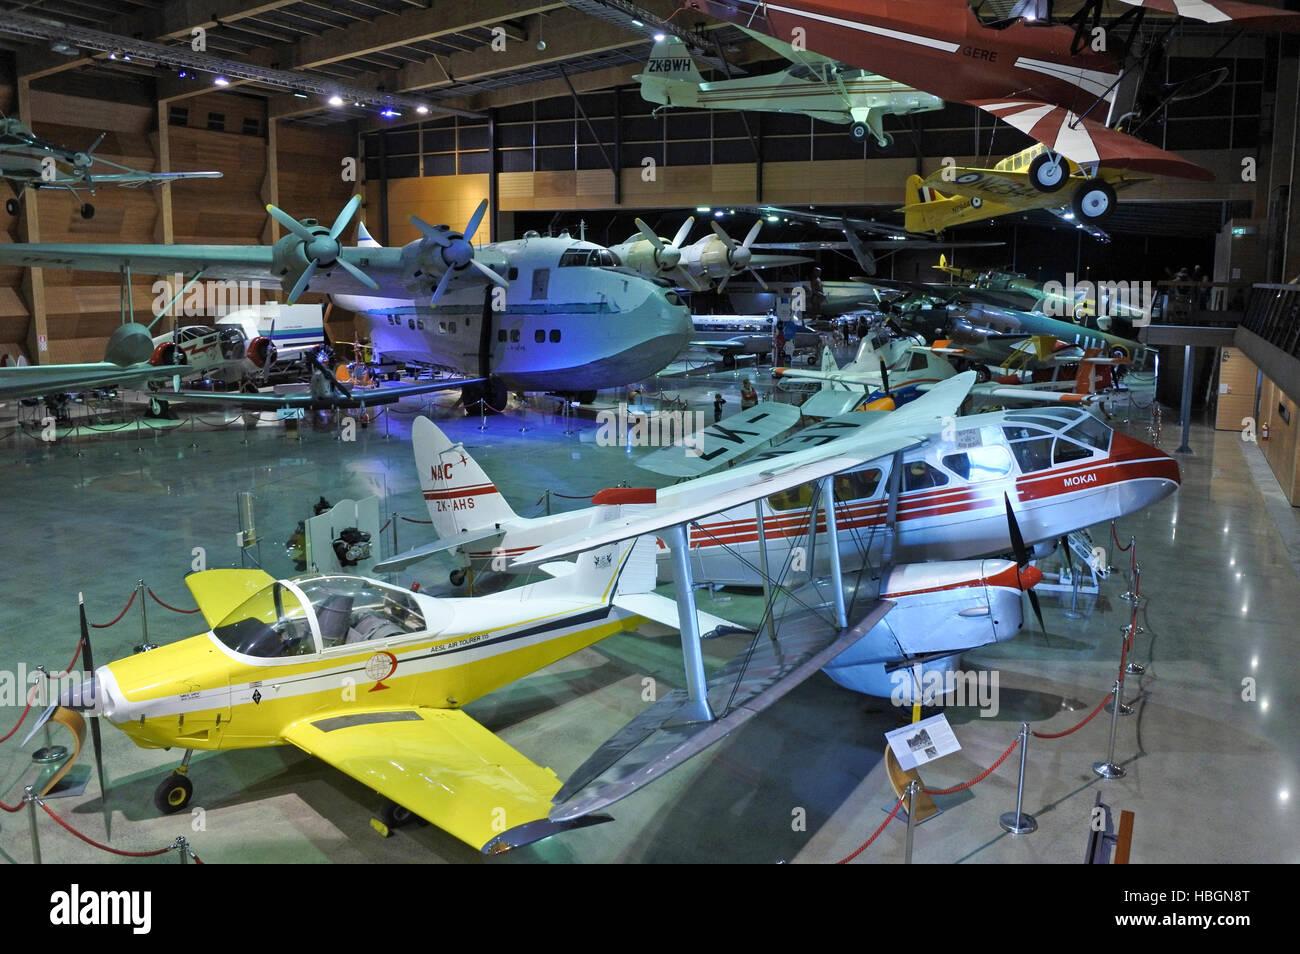 AUCKLAND - OCT 05 2016:Aircraft collection at MOTAT 2, NZ  larger civil aviation housing New Zealand aircrafts from - Stock Image